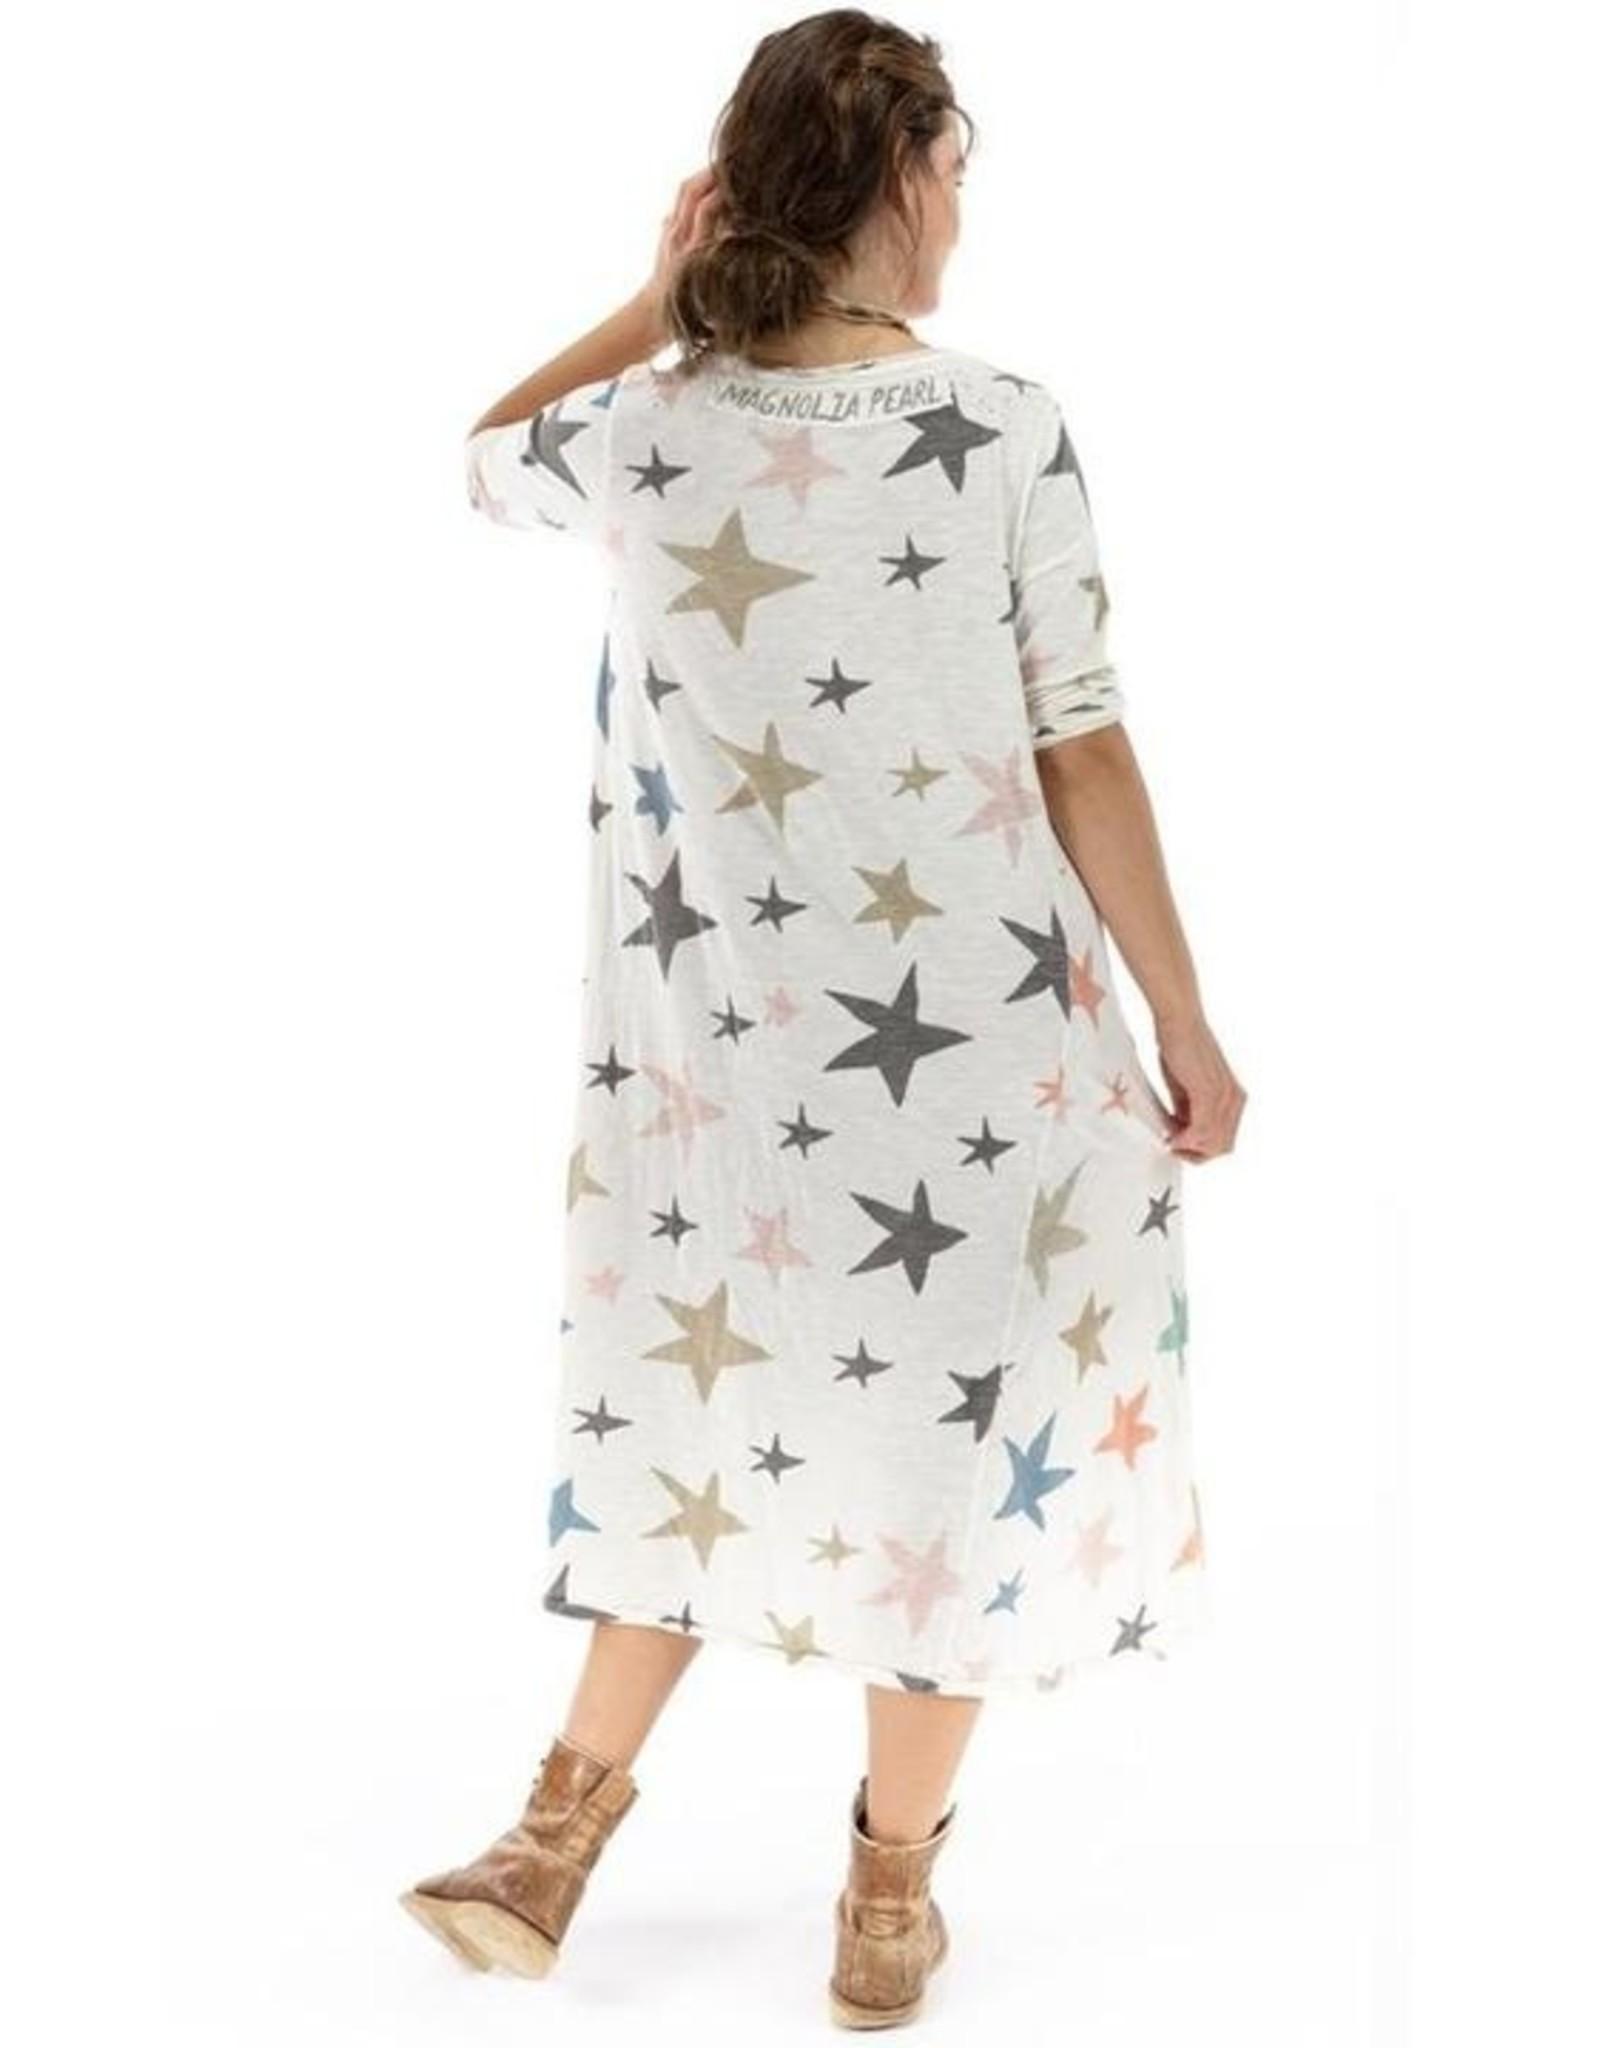 Magnolia Pearl Dylan T Dress - Clouseau